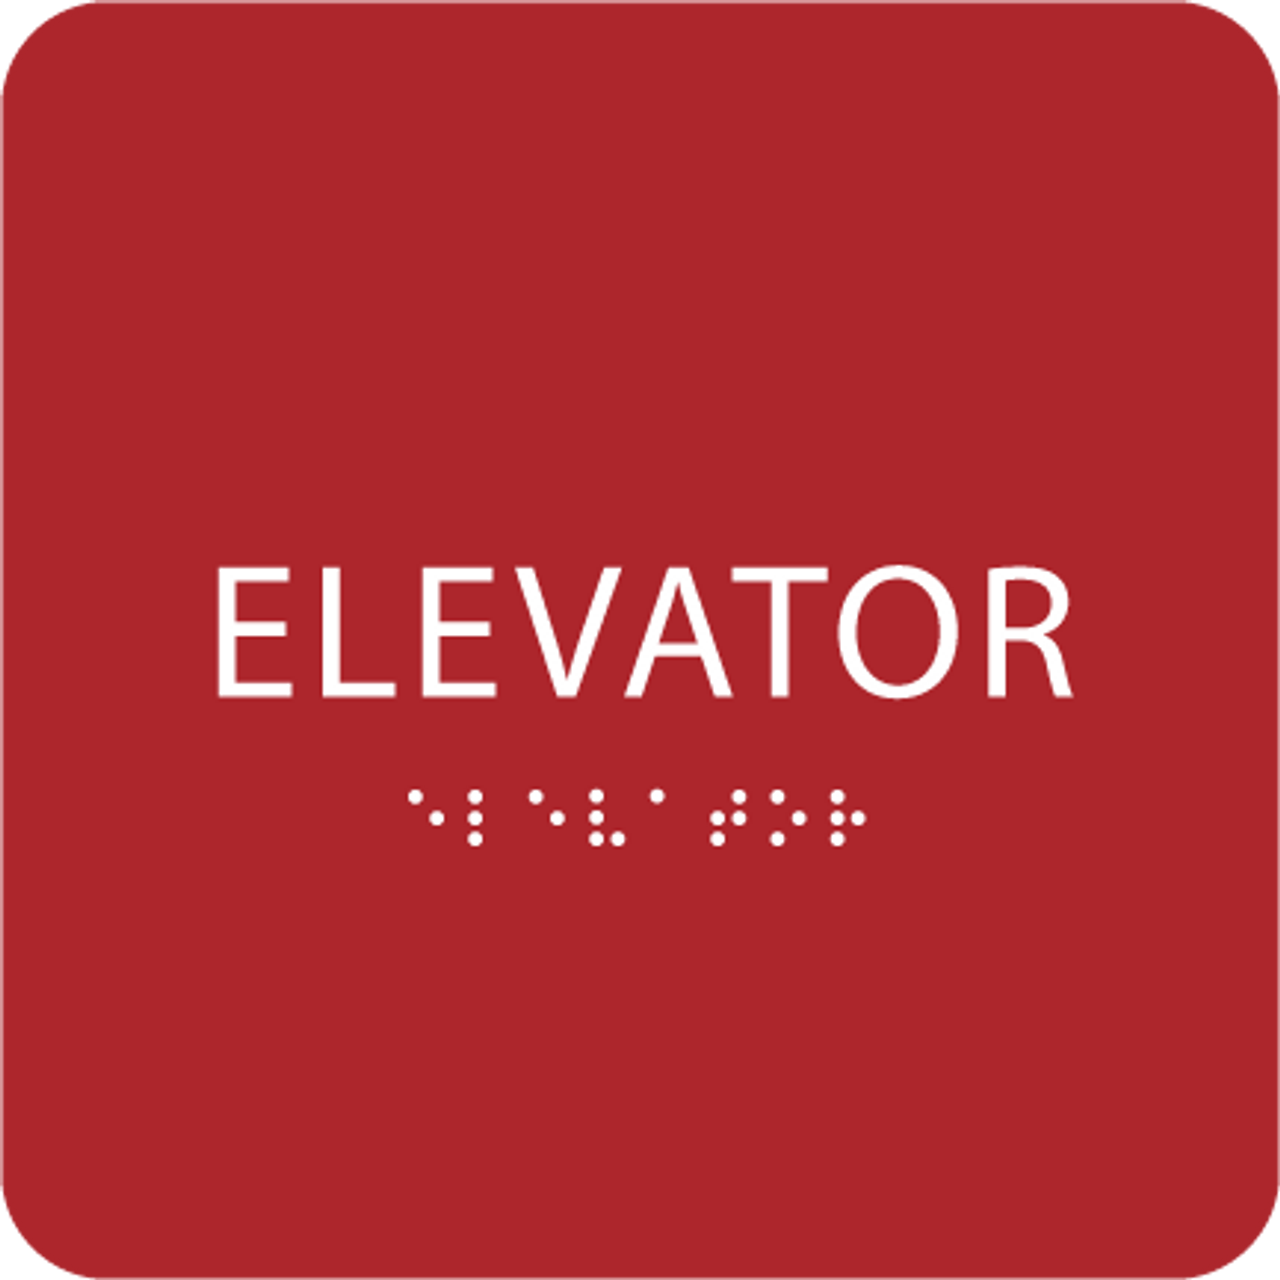 Red ADA Elevator Sign